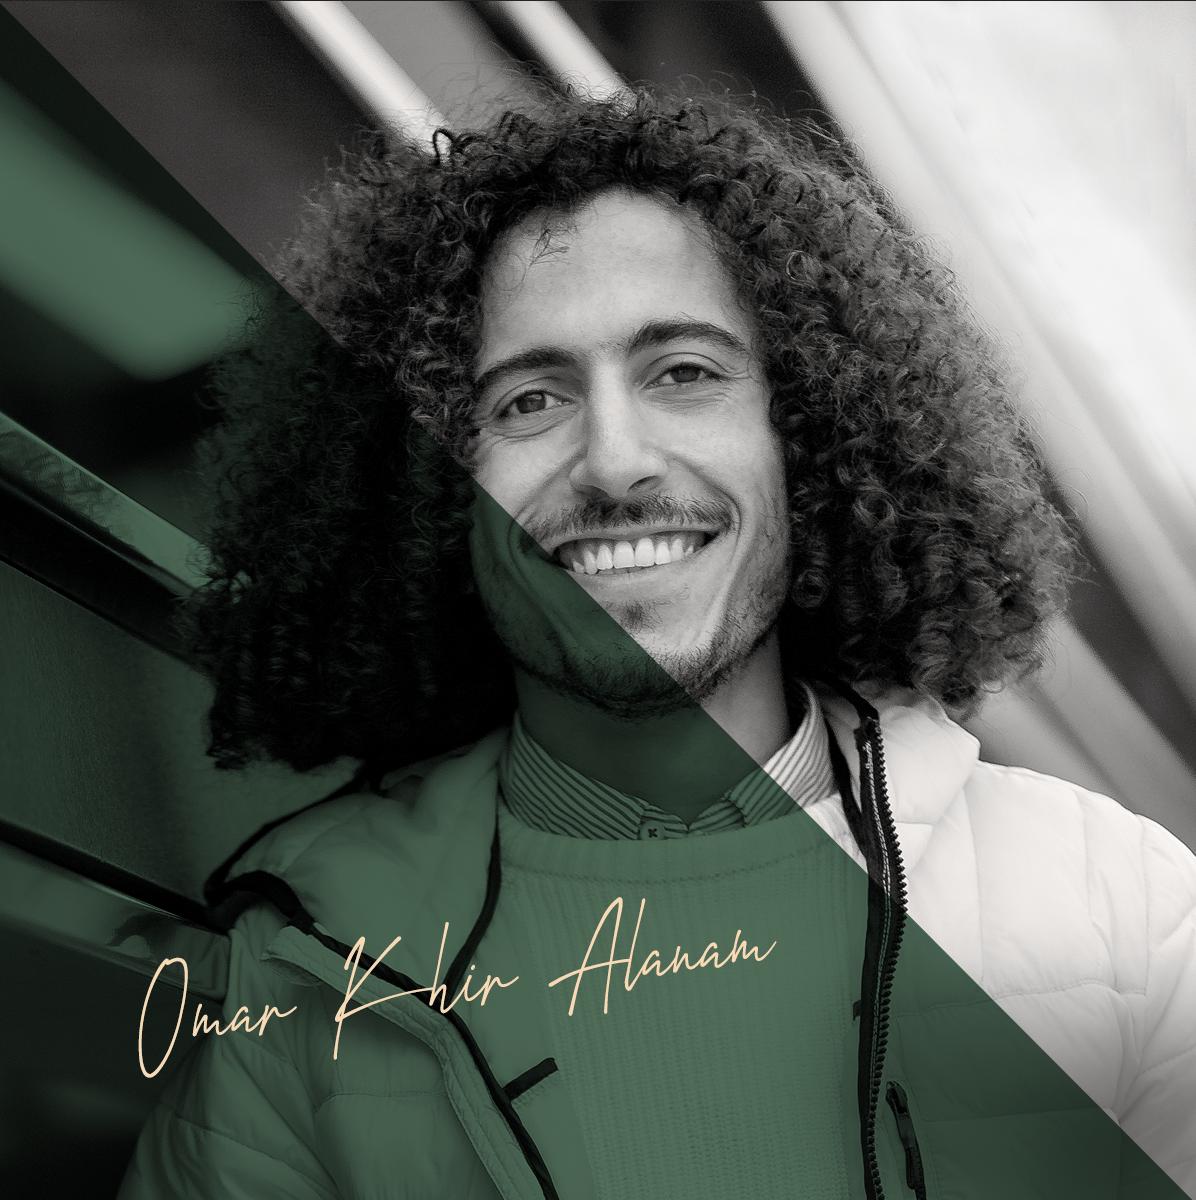 Omar Khir Alanam